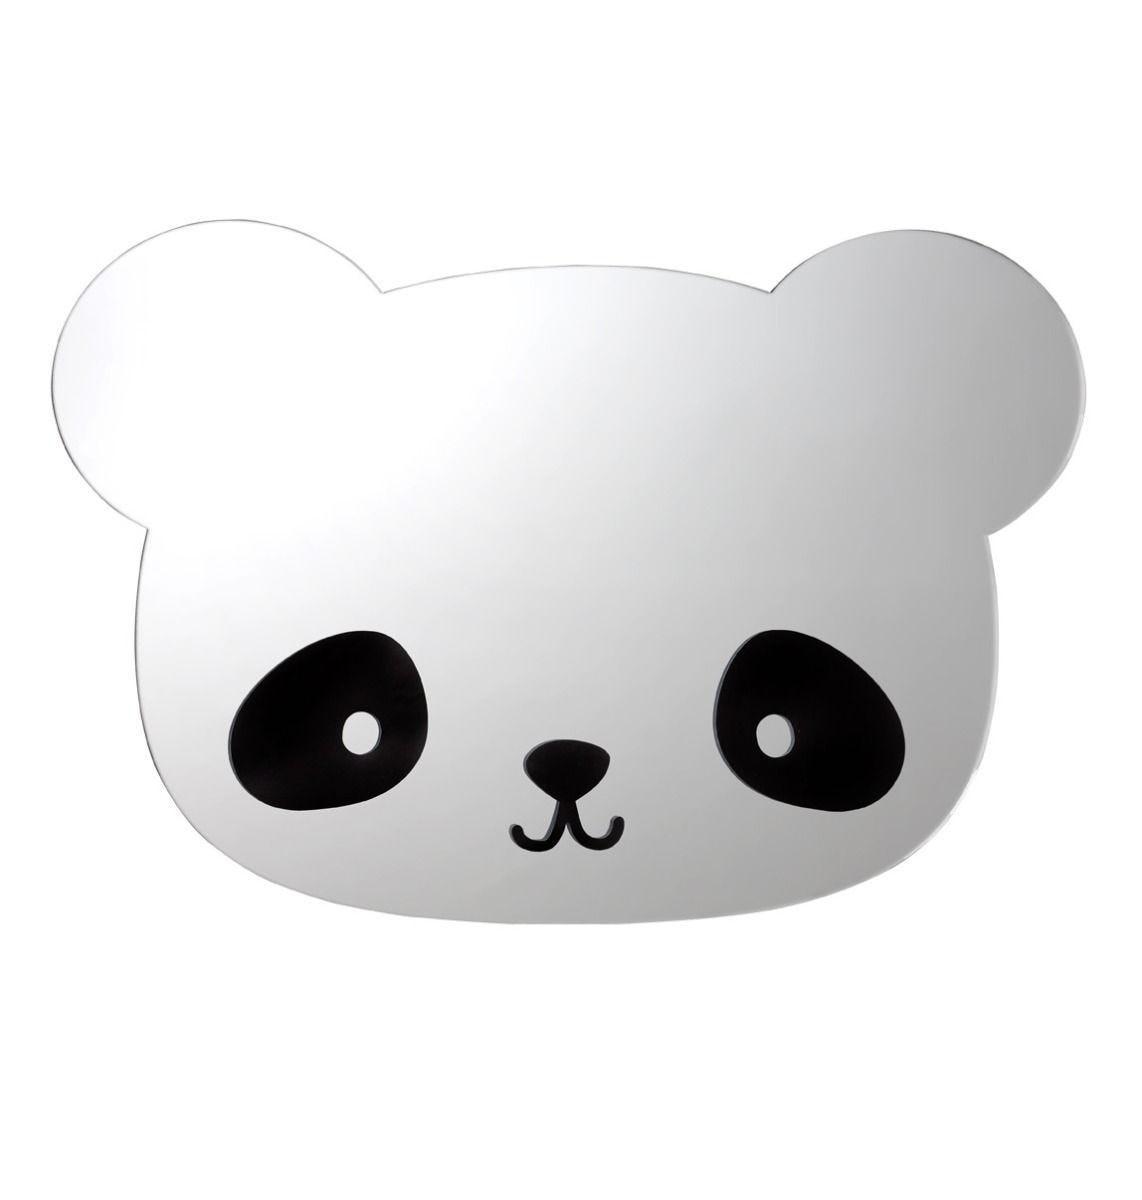 A Little Lovely Company - Mirror: Panda